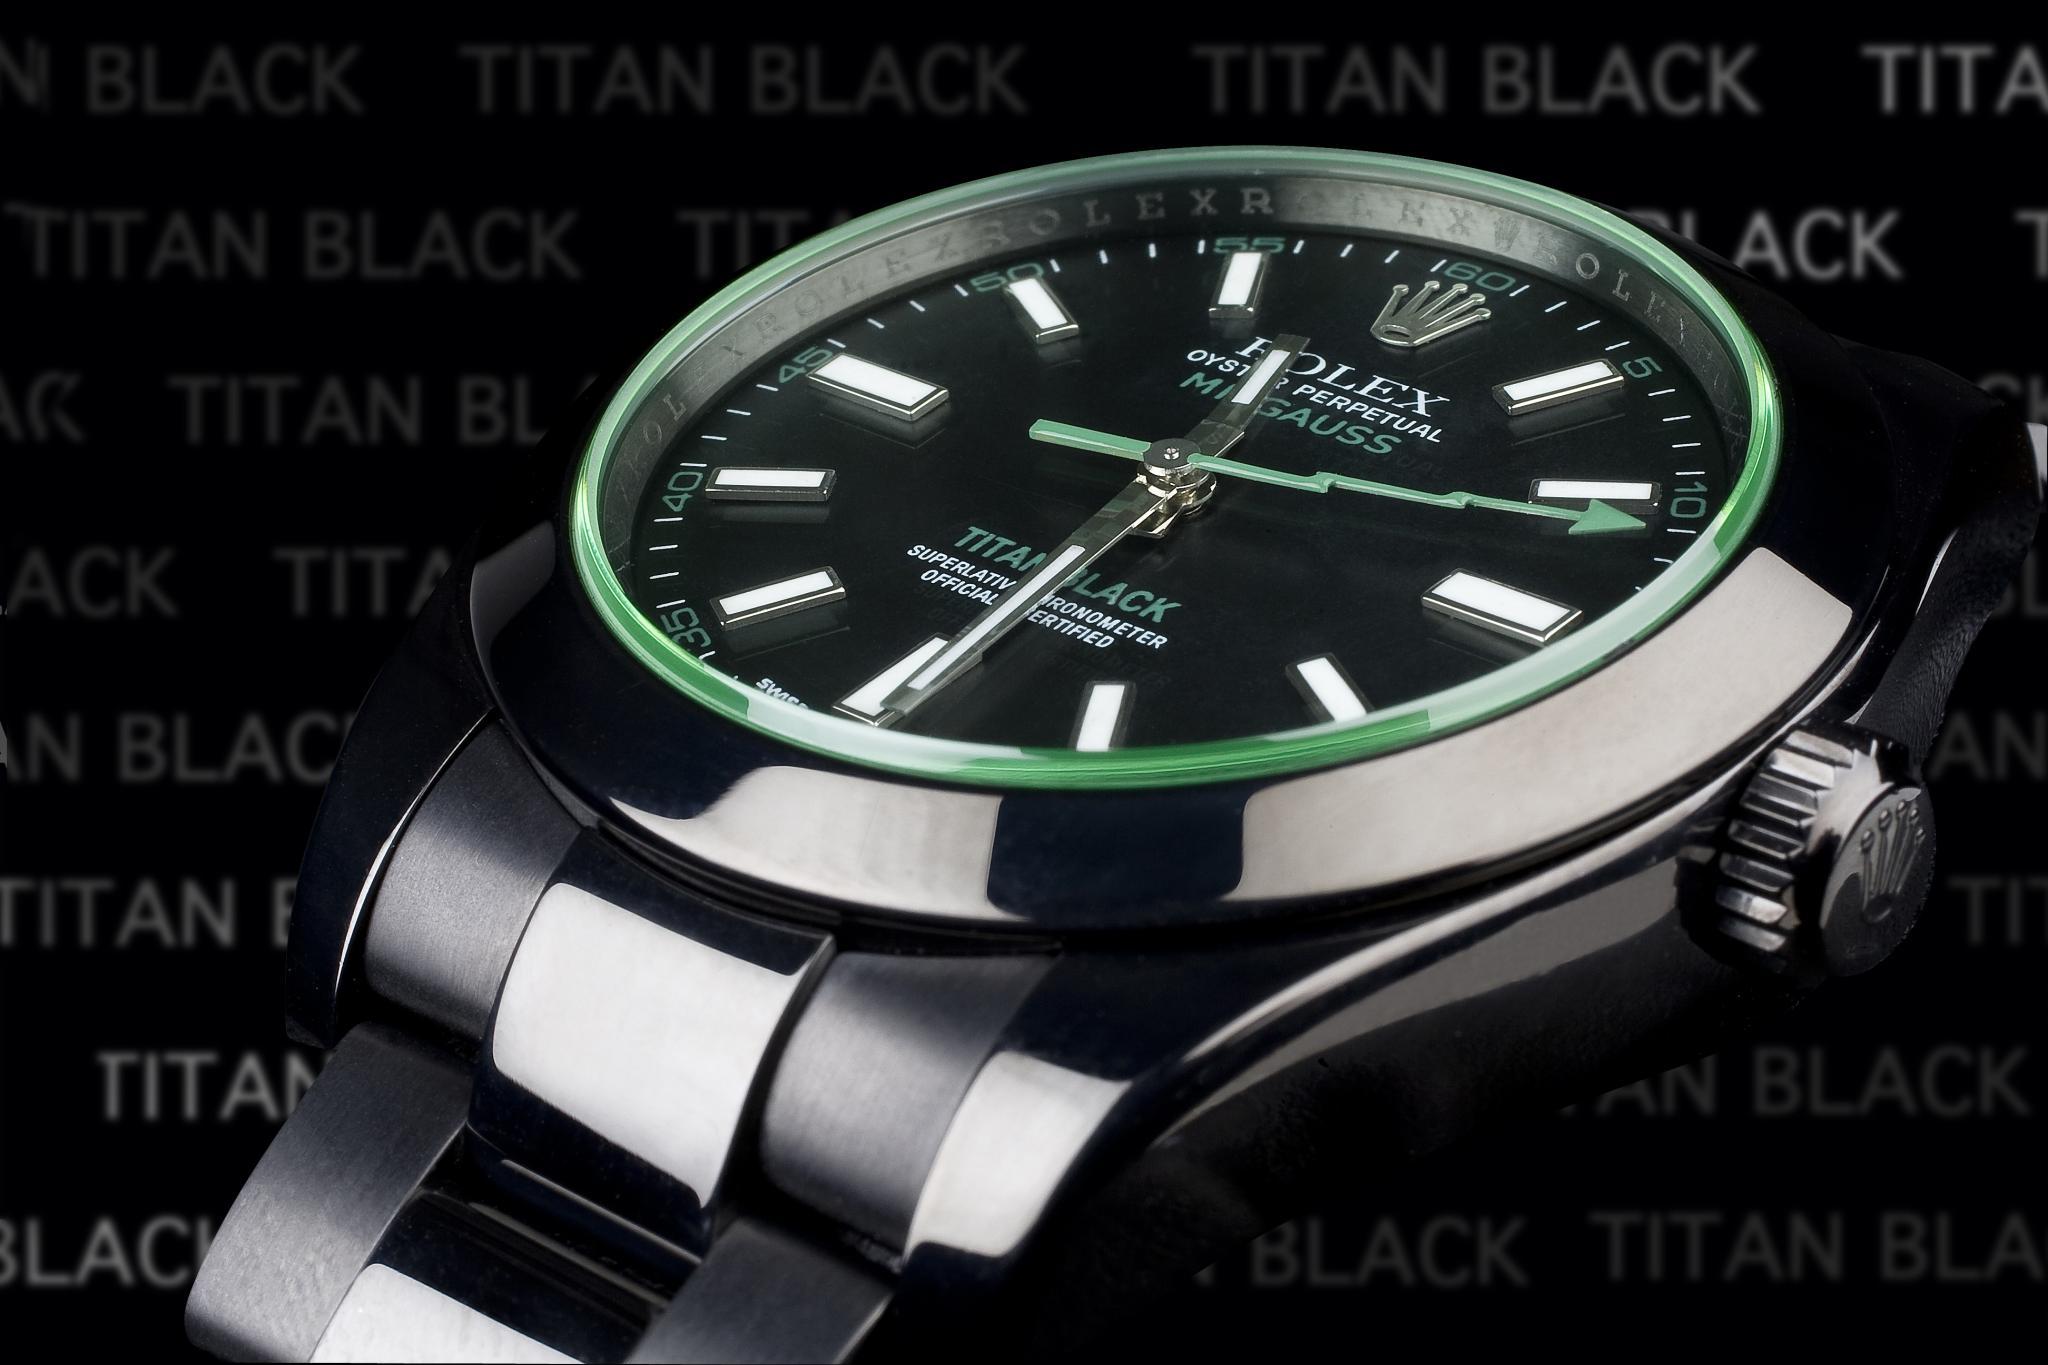 Rolex Milgauss Envy Titan Black